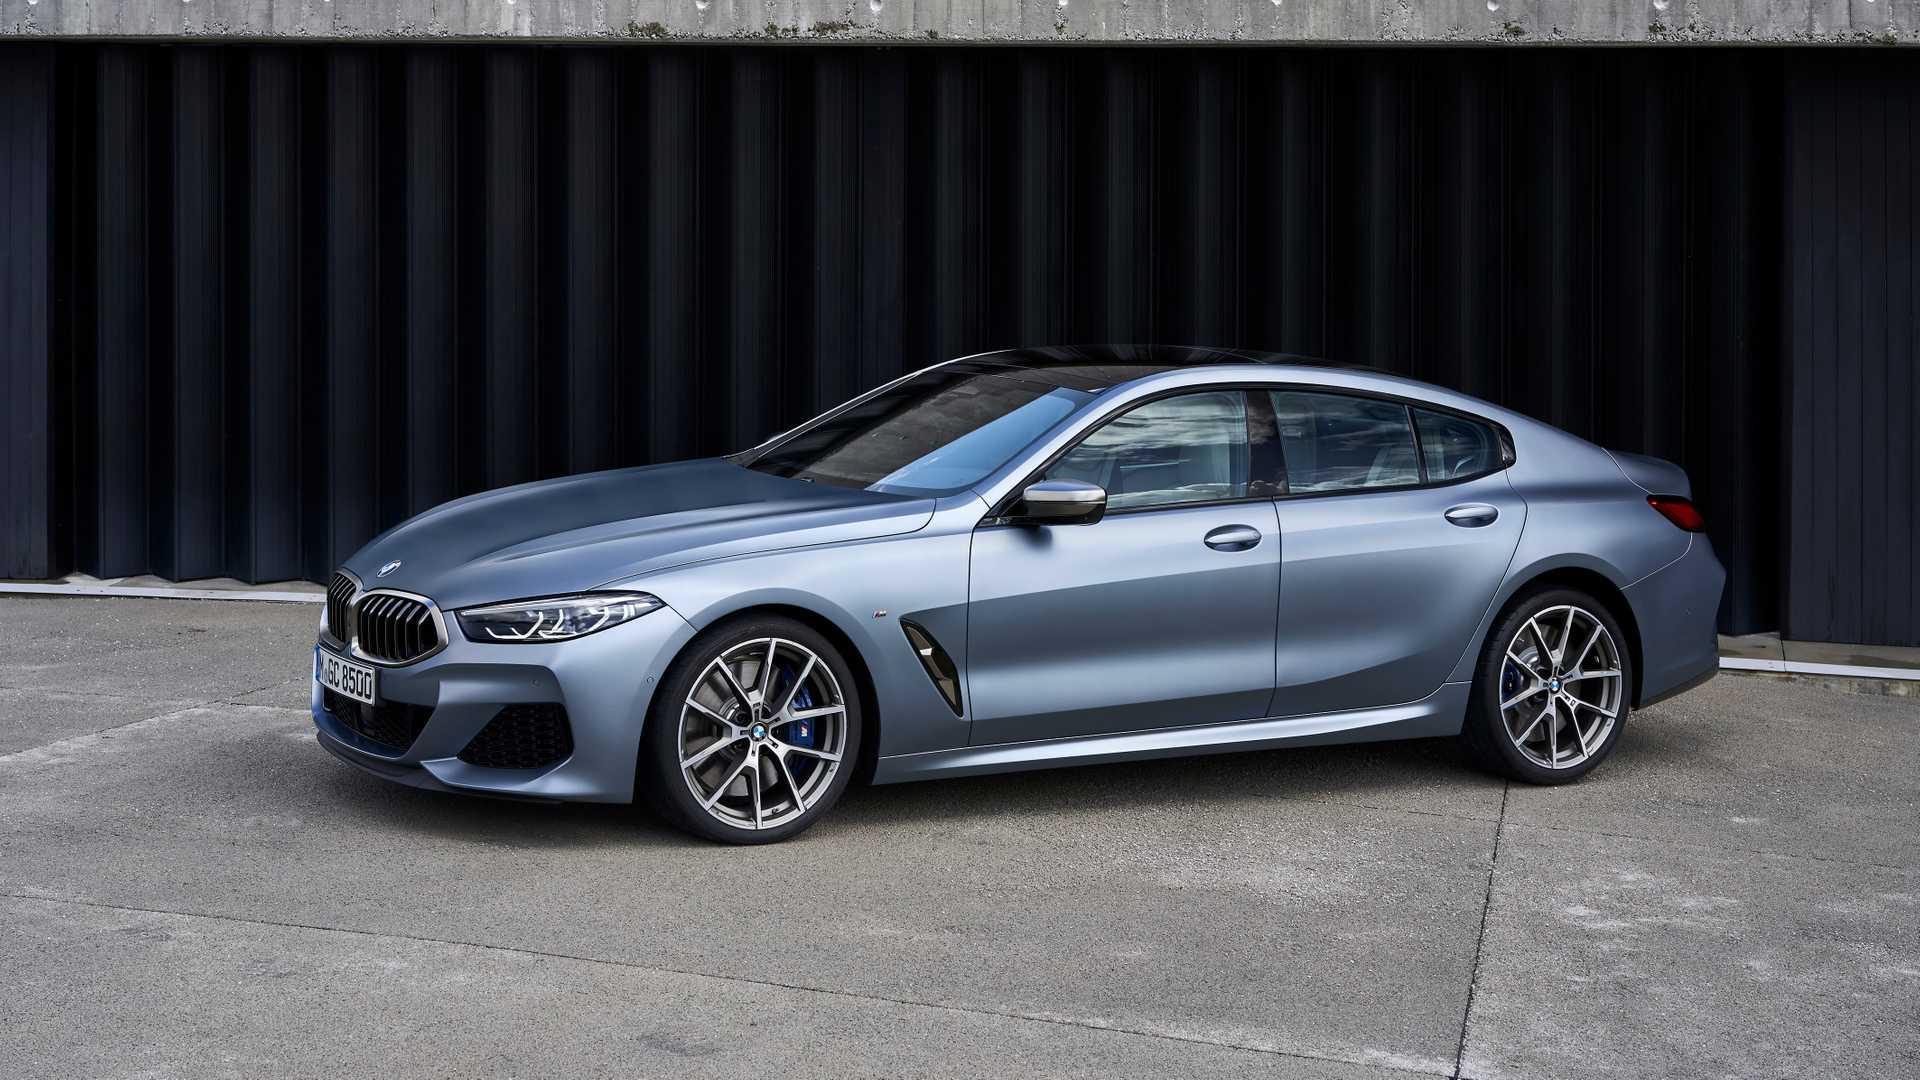 bmw-serie-8-gran-coupe-2020 (9)